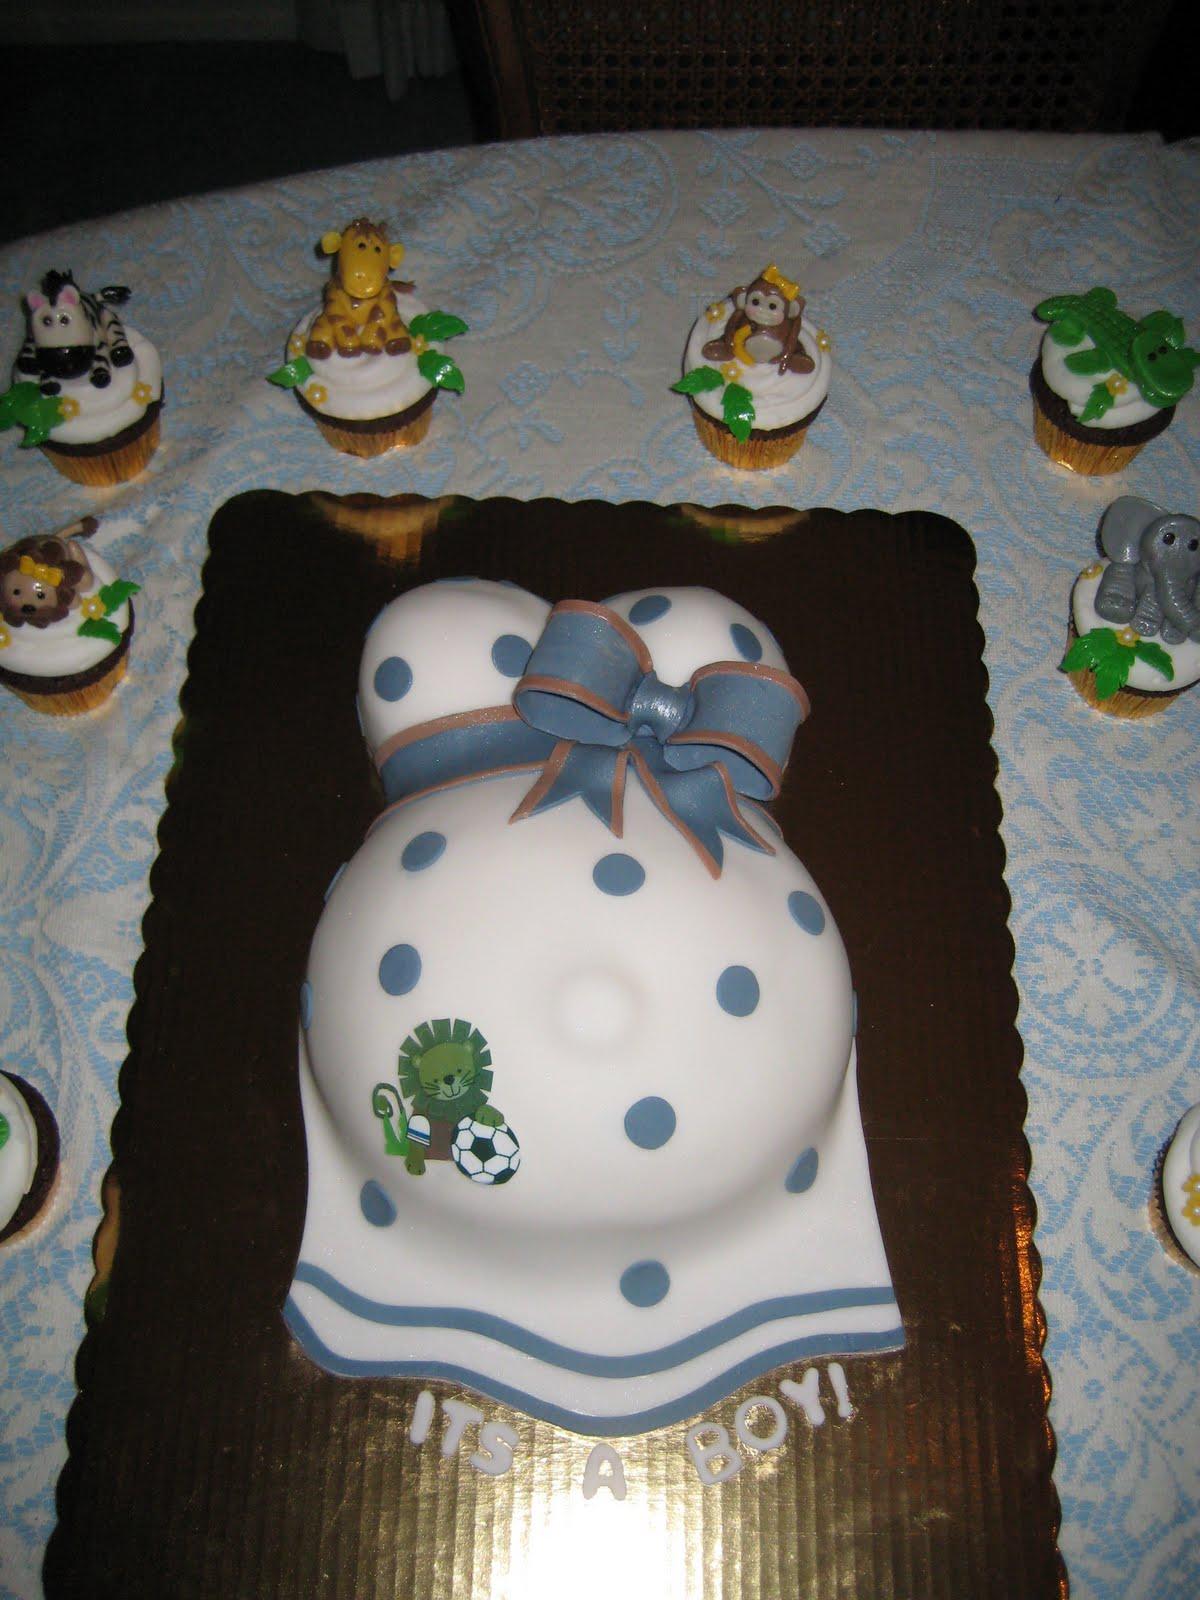 Baby Bump Cake Images : Bashert Cakes: Baby Bump Cake